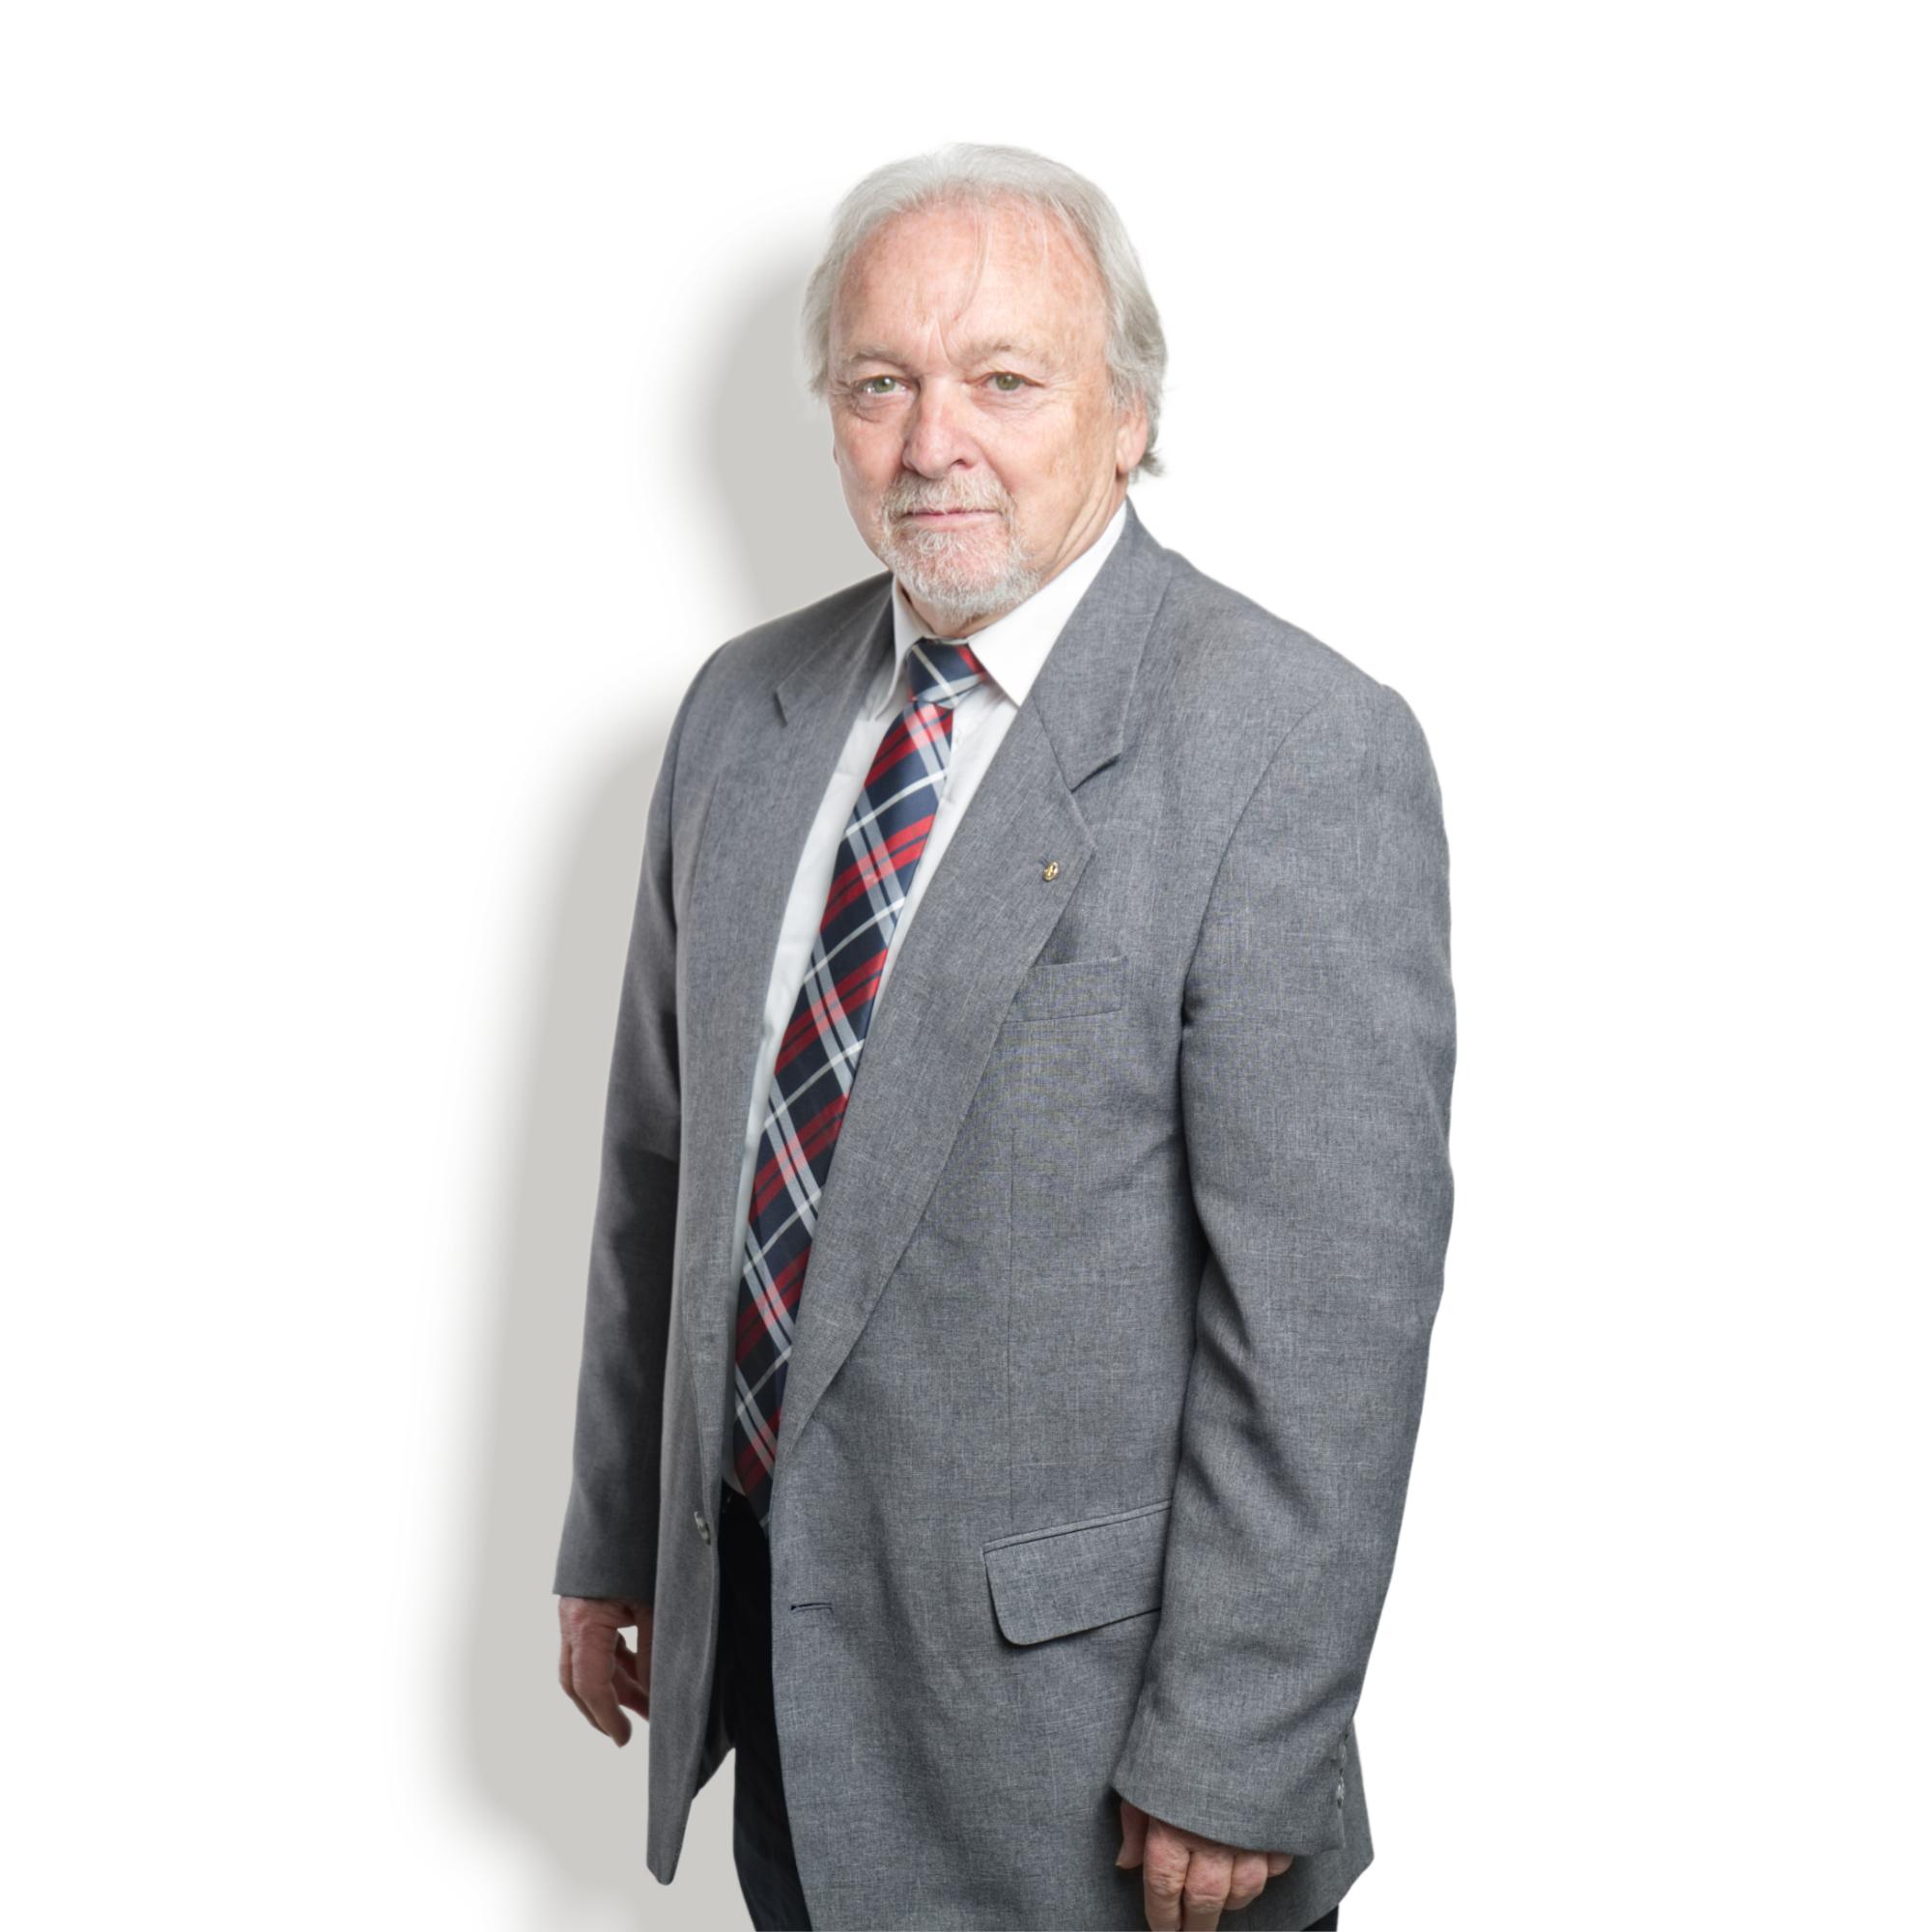 Hermann Wieland